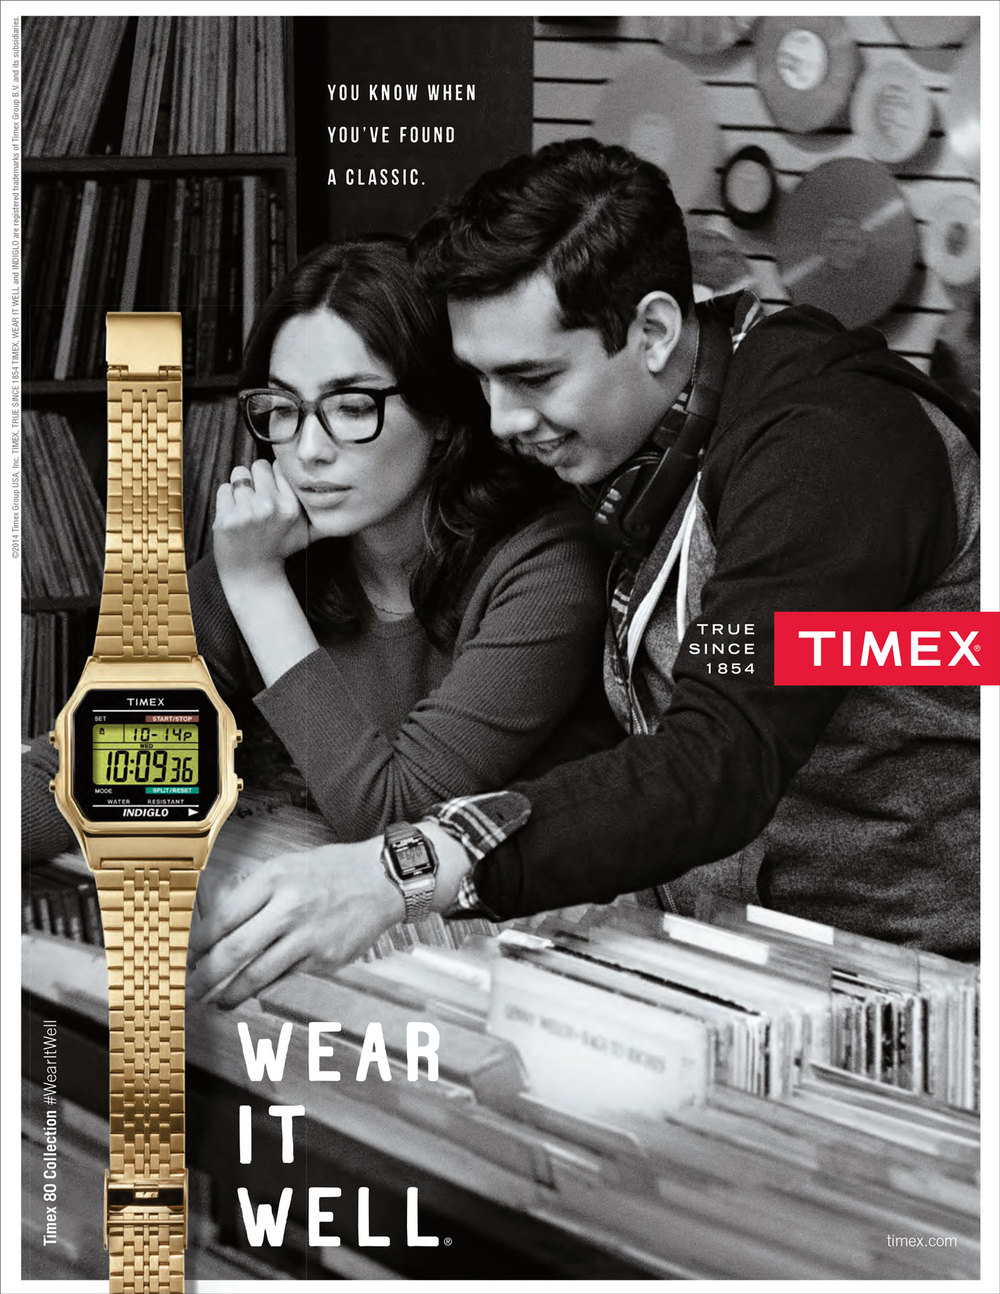 3089_AD14f-Maxim-Mag-Timex-80-FINAL-X1A.jpg